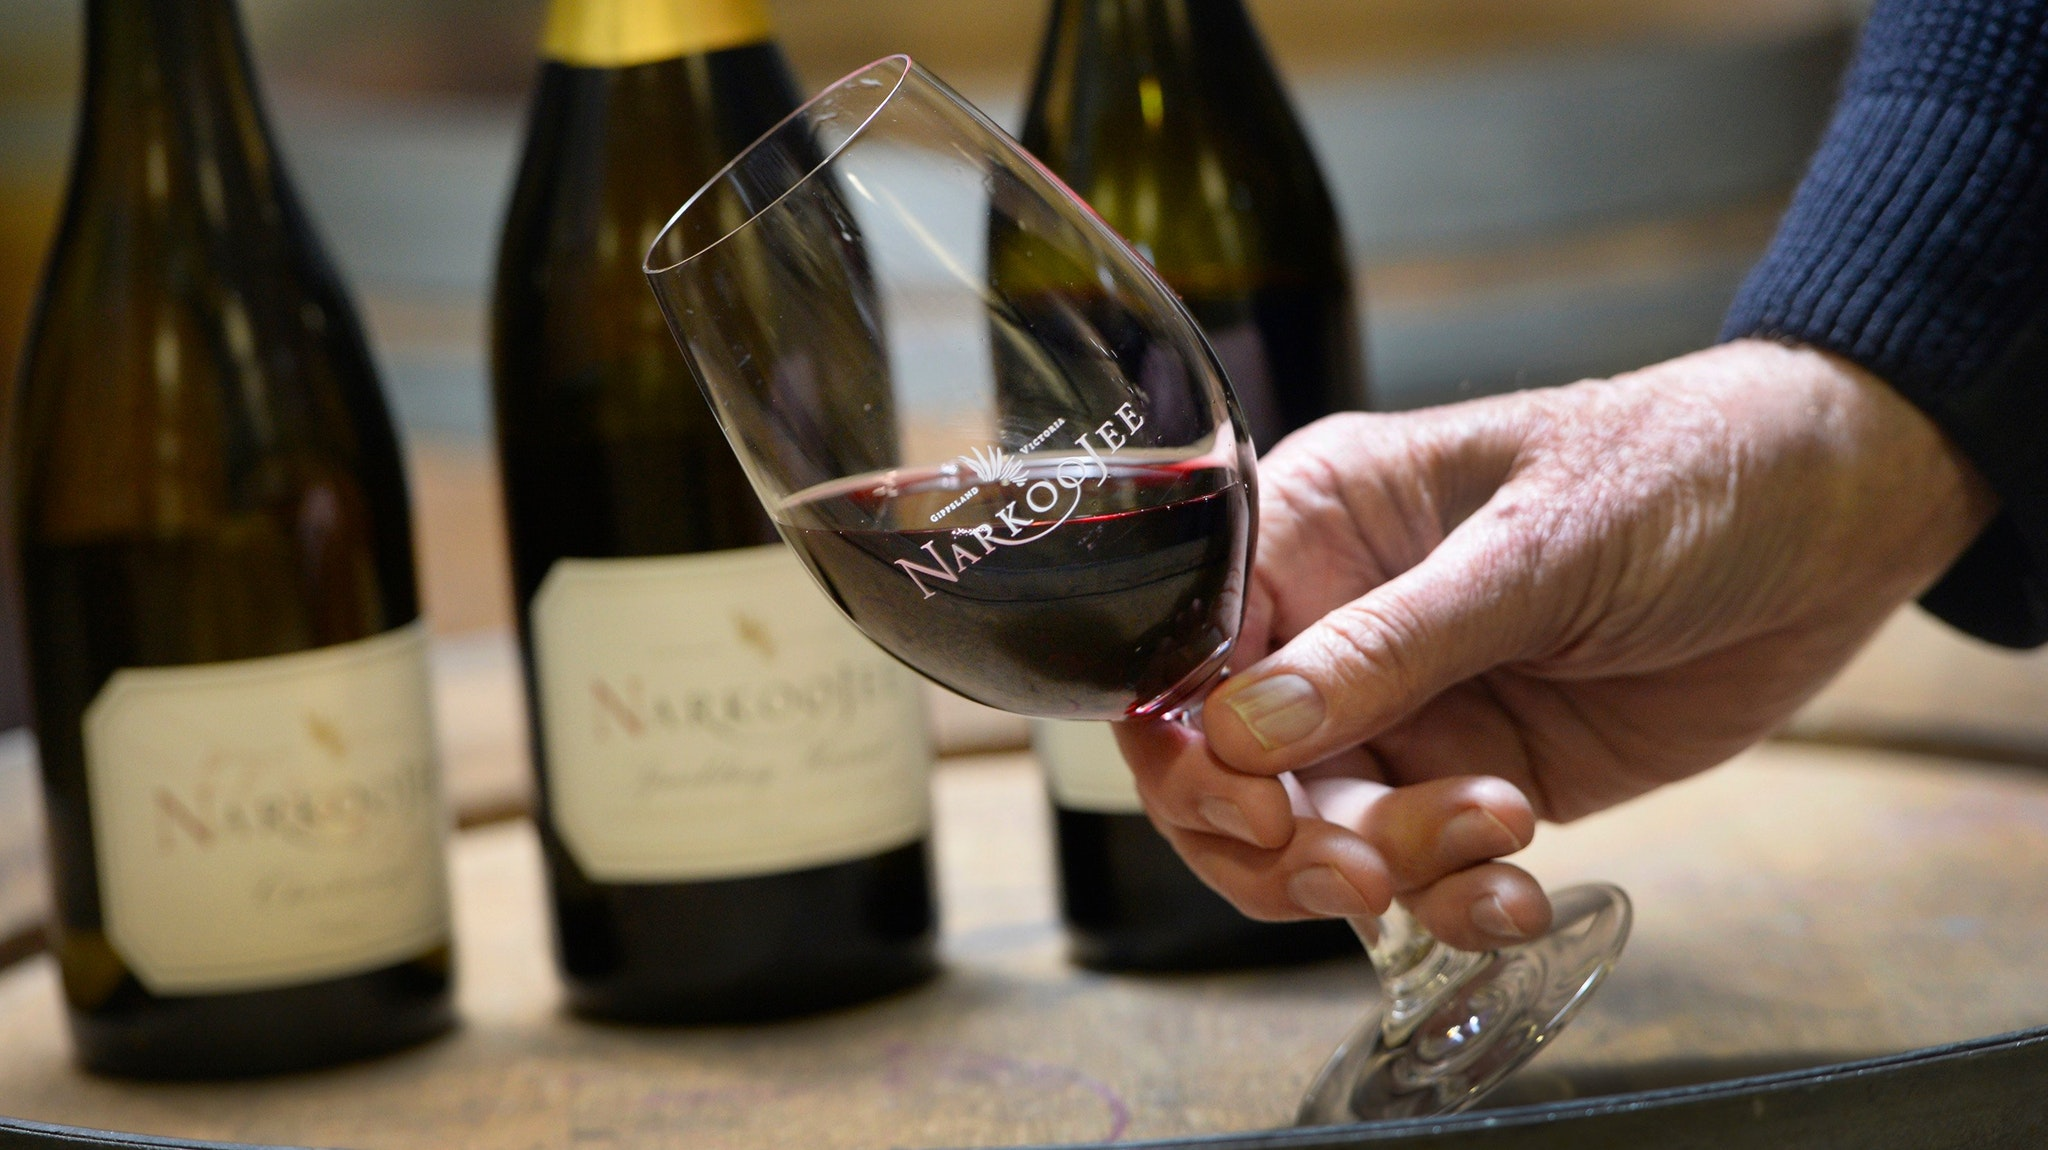 Narkoojee wines -  Glengarry - Traralgon - Latrobe - Gippsland